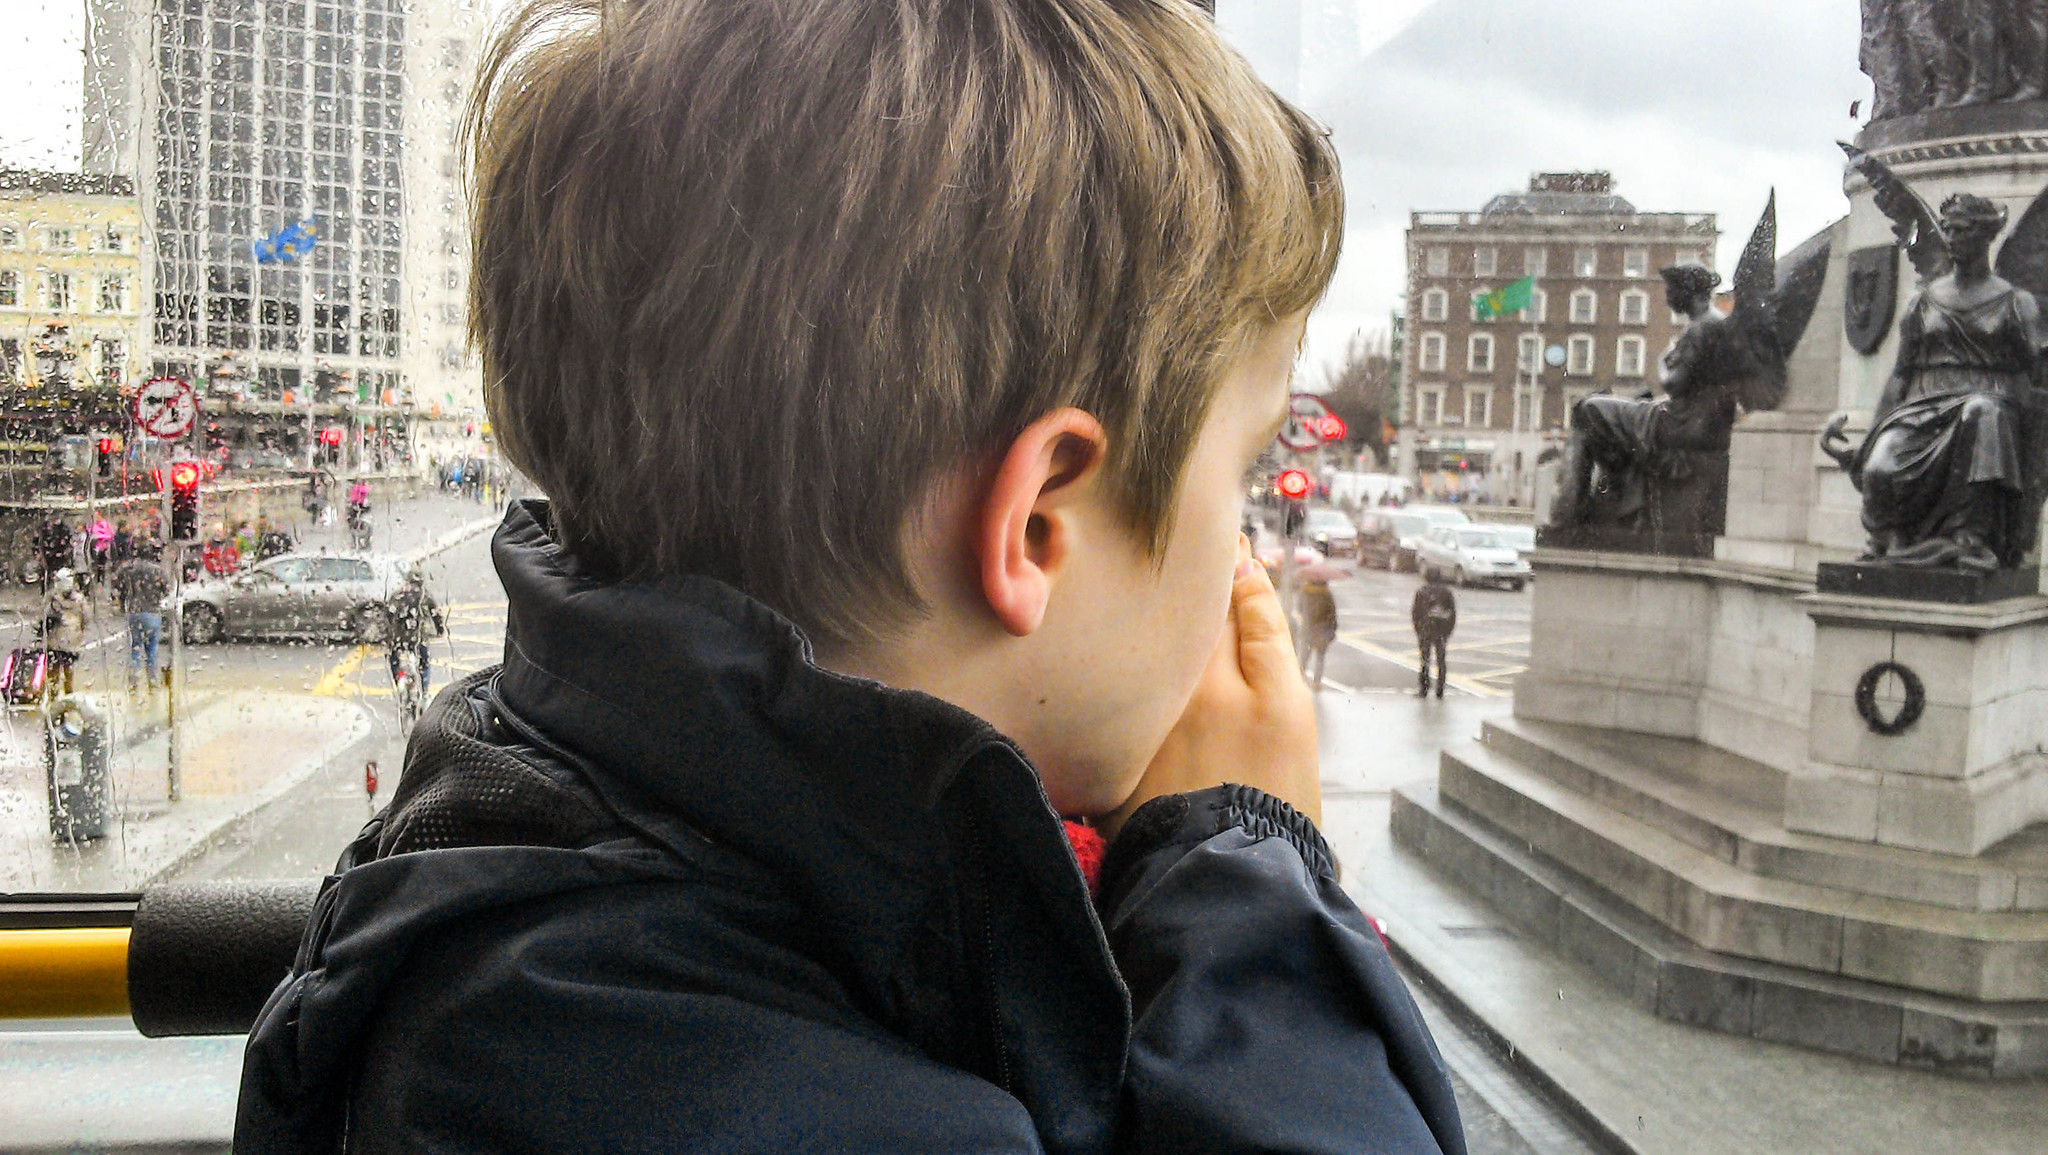 Child on Dublin Bus